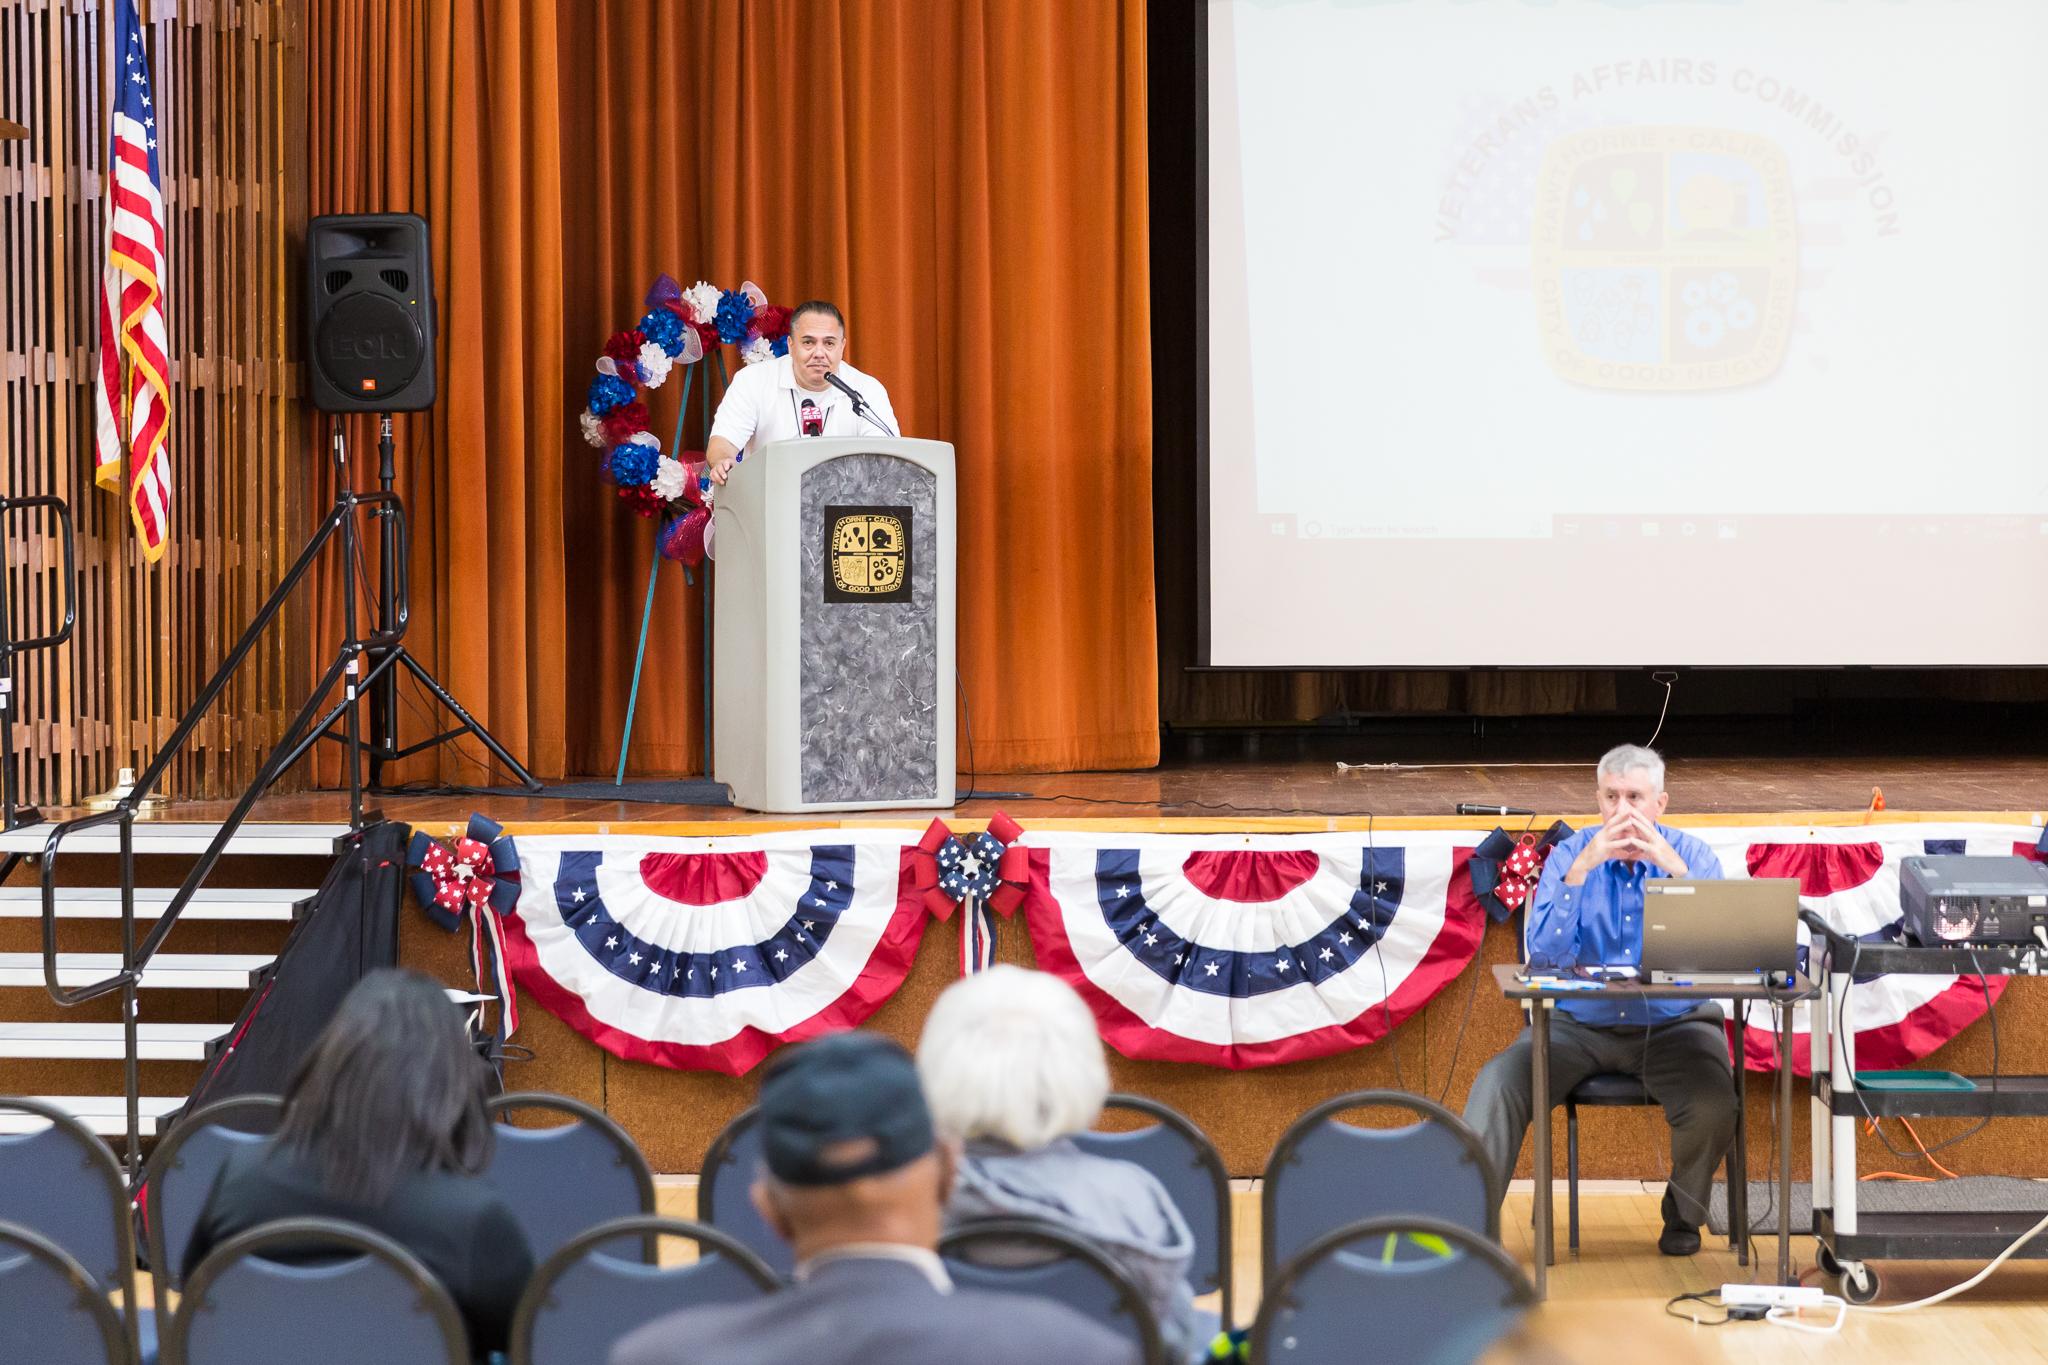 Mayor Alex Vargas at the podium